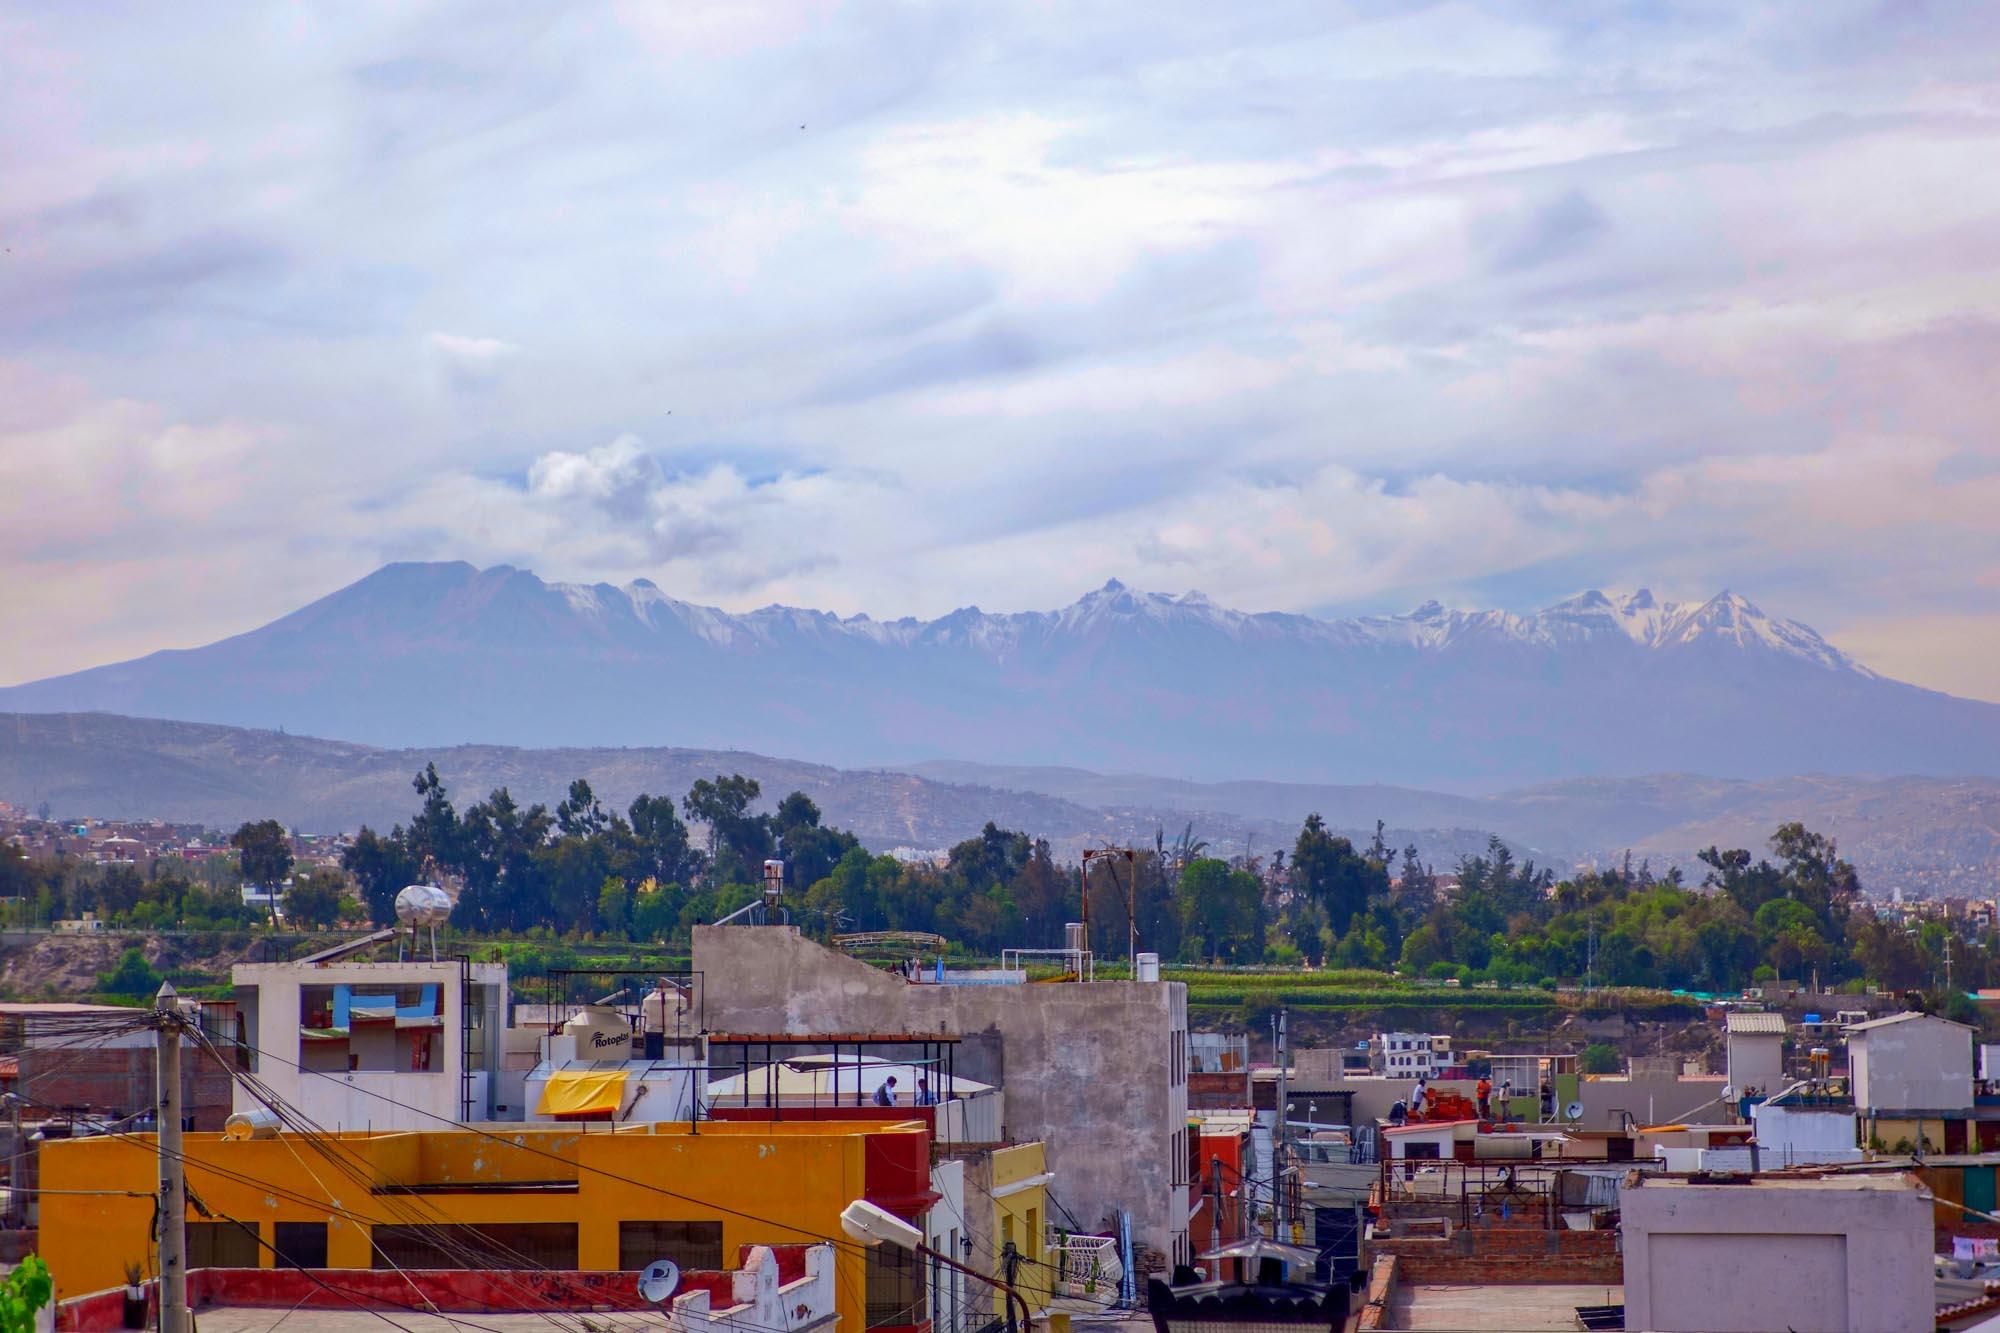 Le mirador de Yanahuara à Arequipa